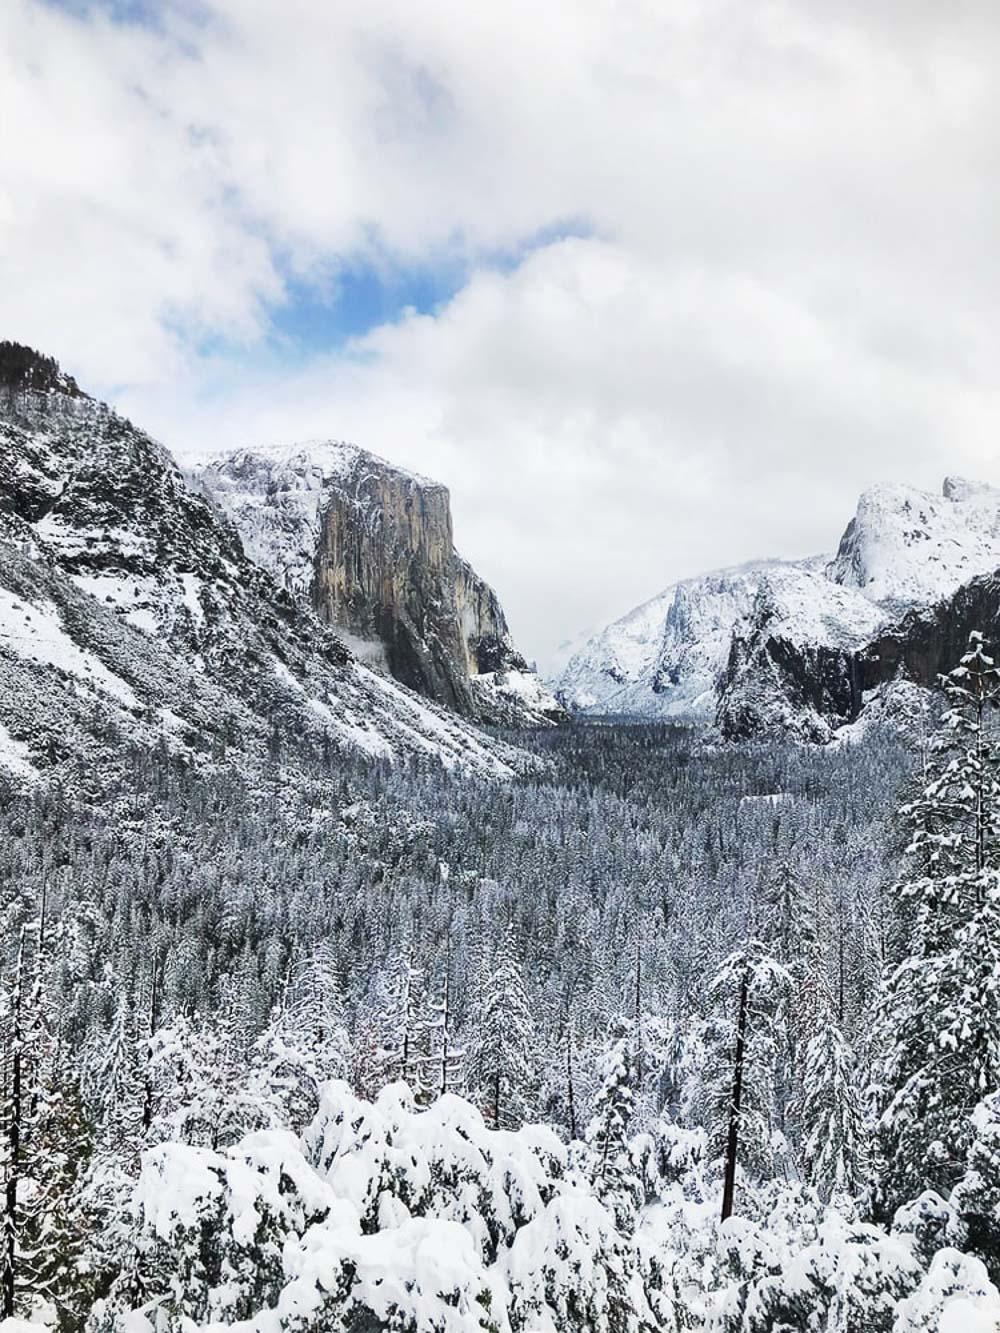 Yosemite - Roads and Destinations, roadsanddestinations.com